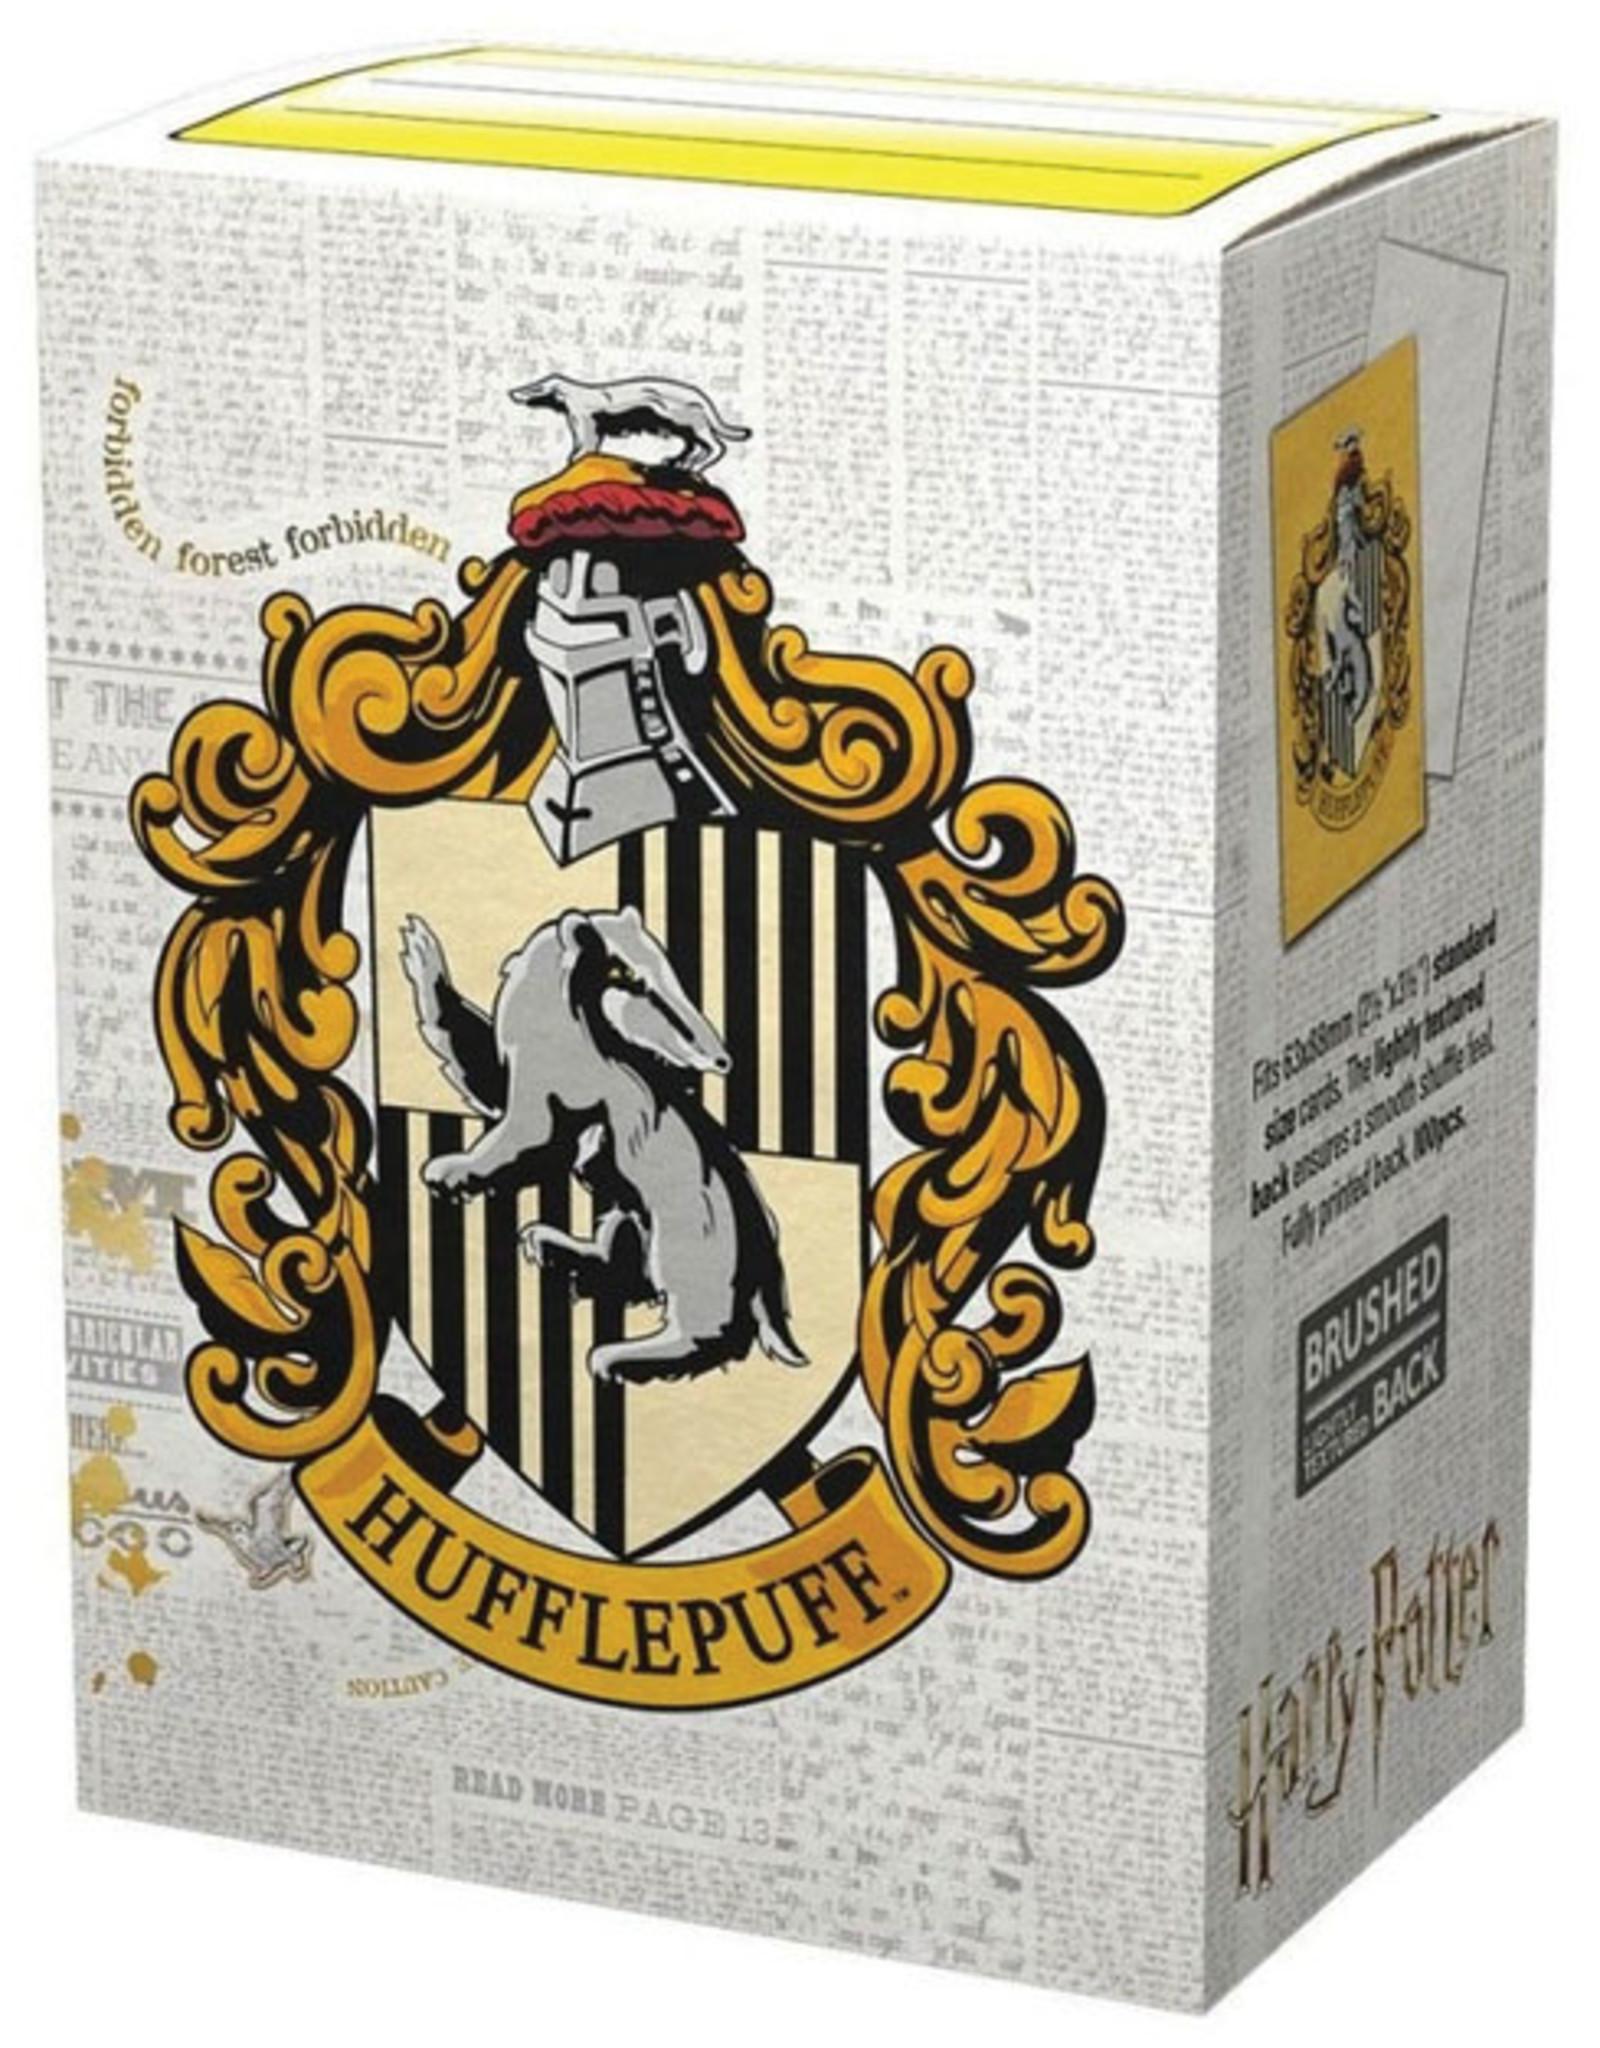 Arcane Tinmen Dragon Shields: (100) Brushed Art - Harry Potter Wizarding World - Hufflepuff